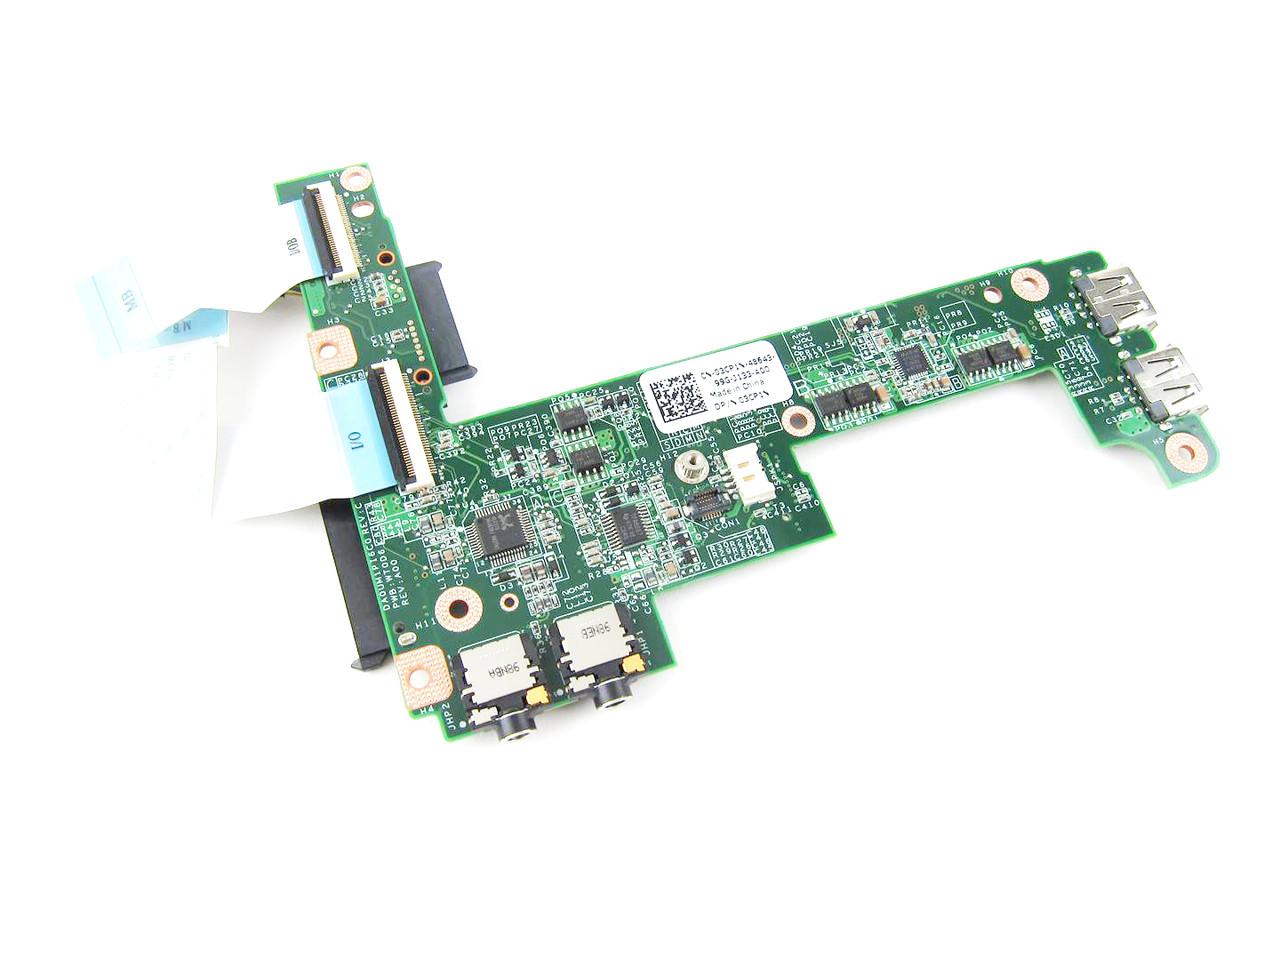 Dell Inspiron 1470 Audio / USB Audio Circuit Board - 3CP1N